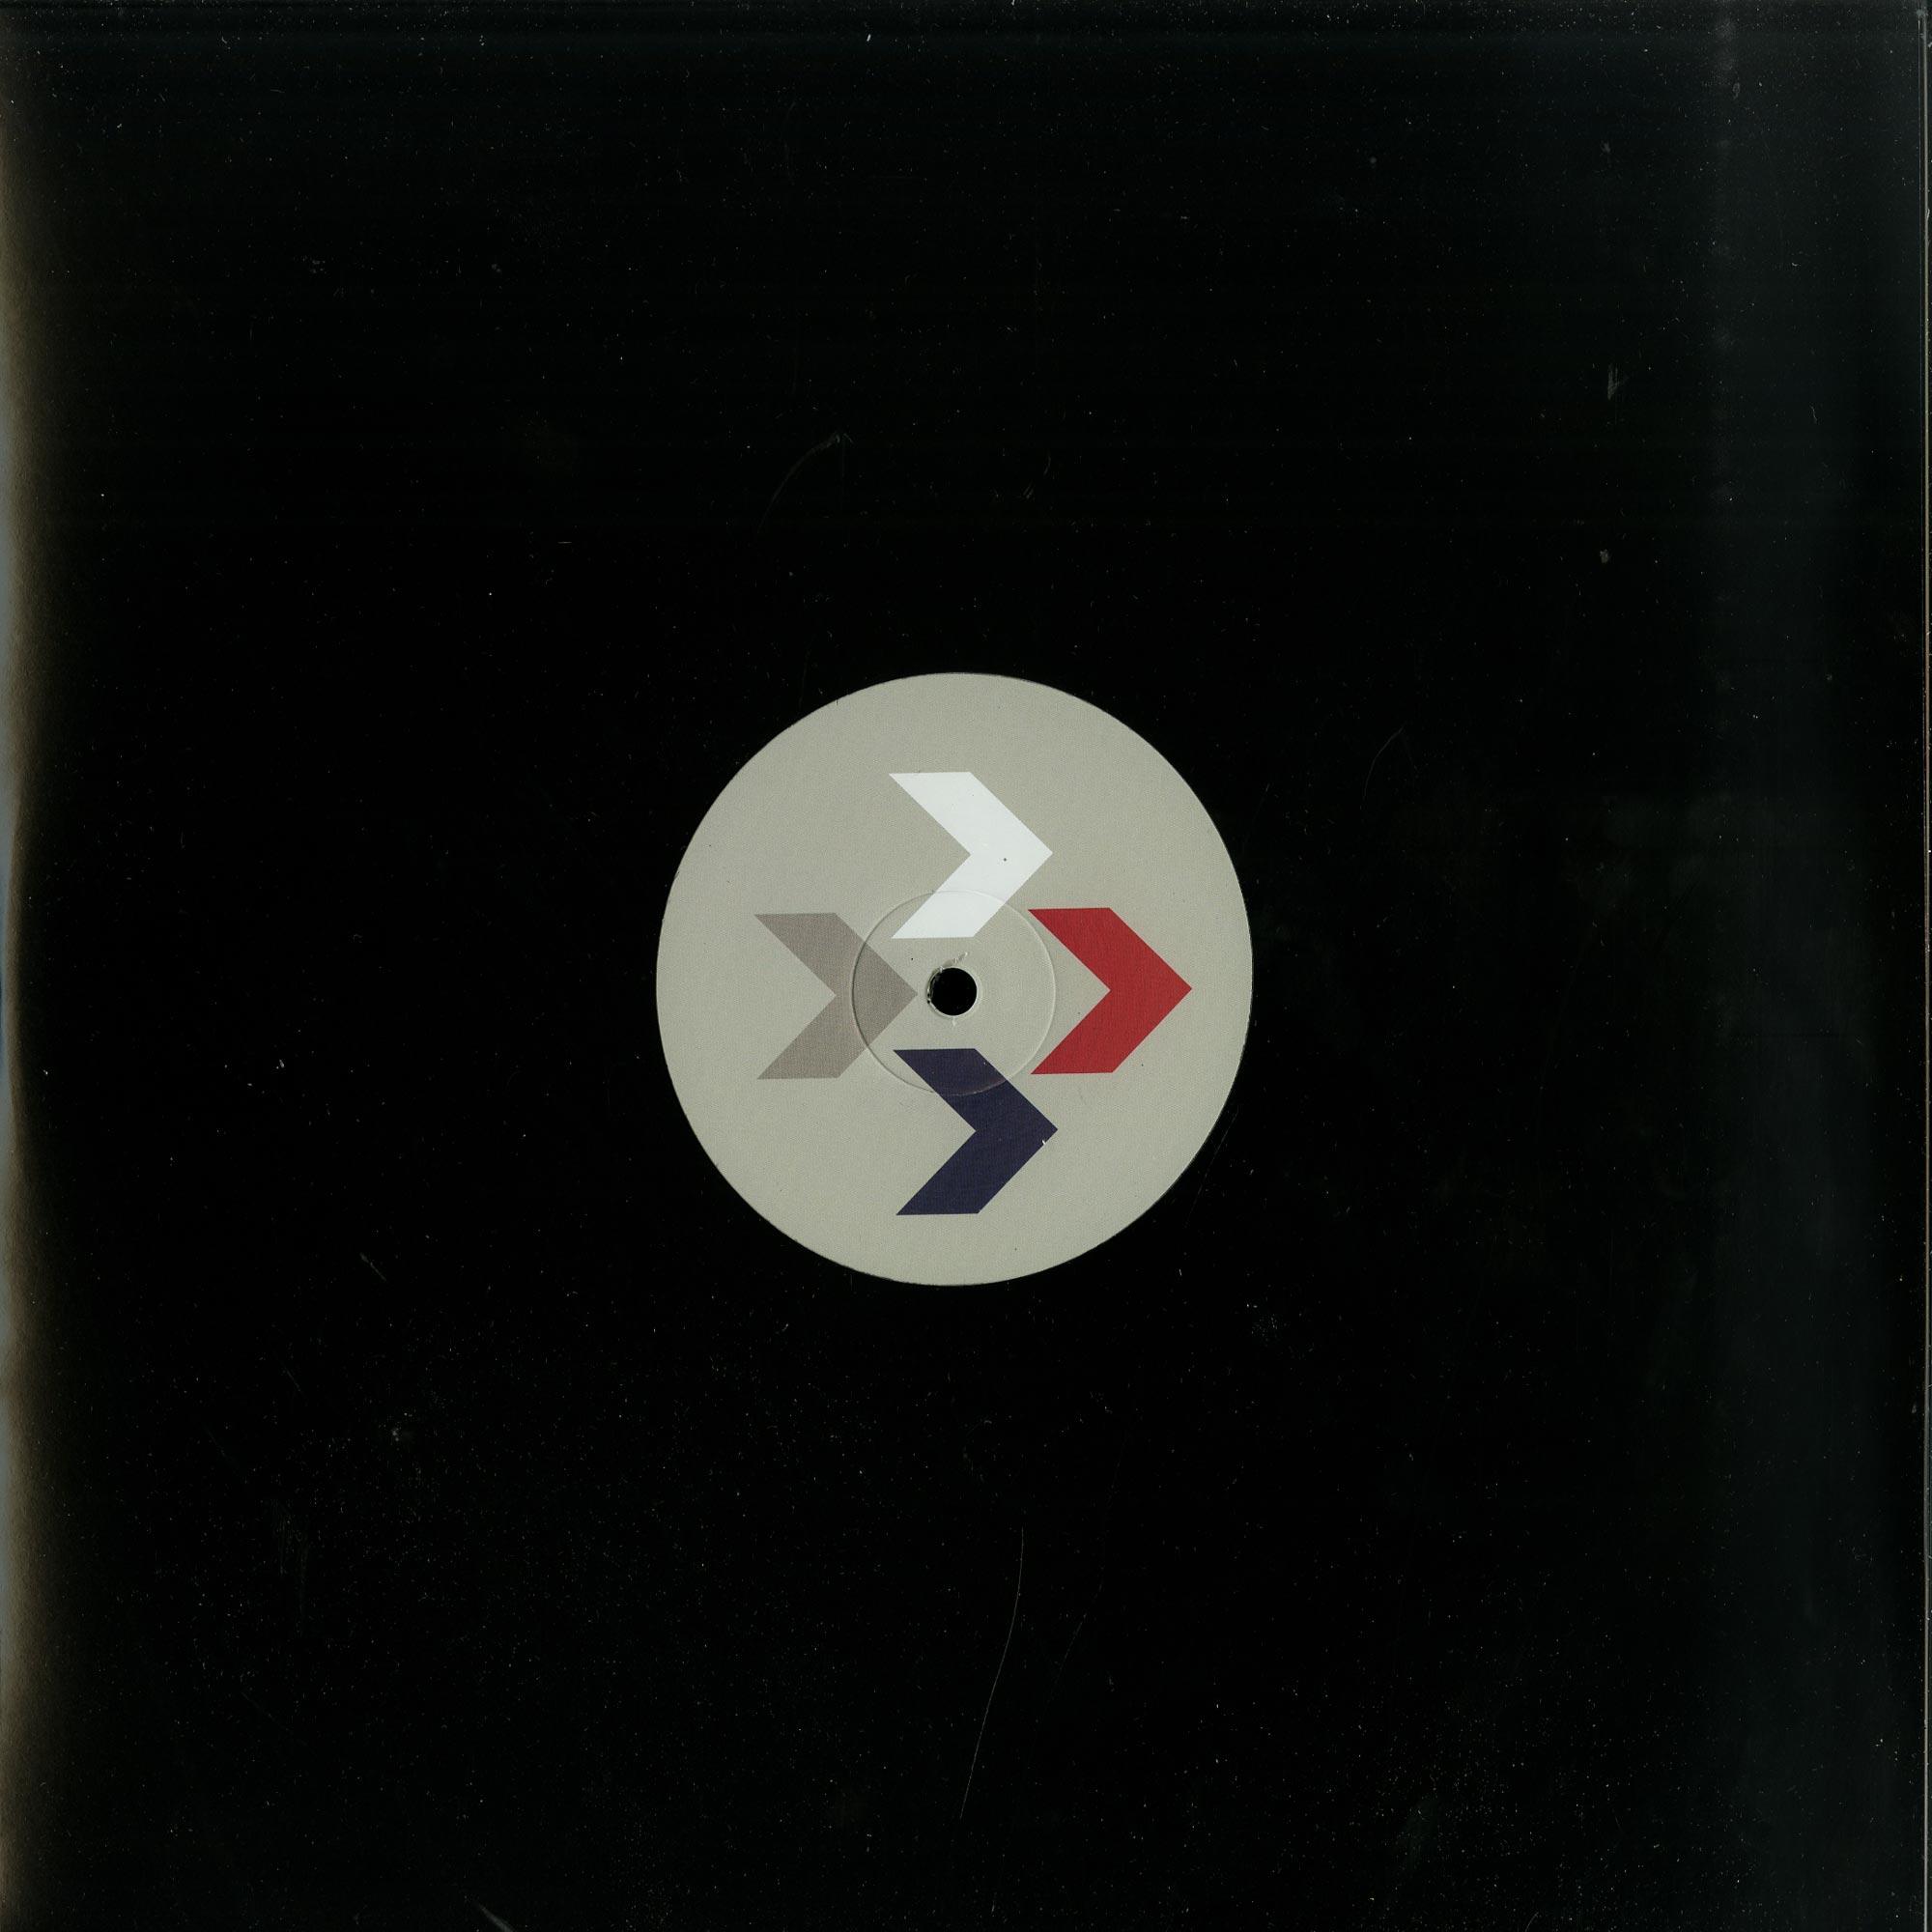 Mako - Fourfit 009 EP